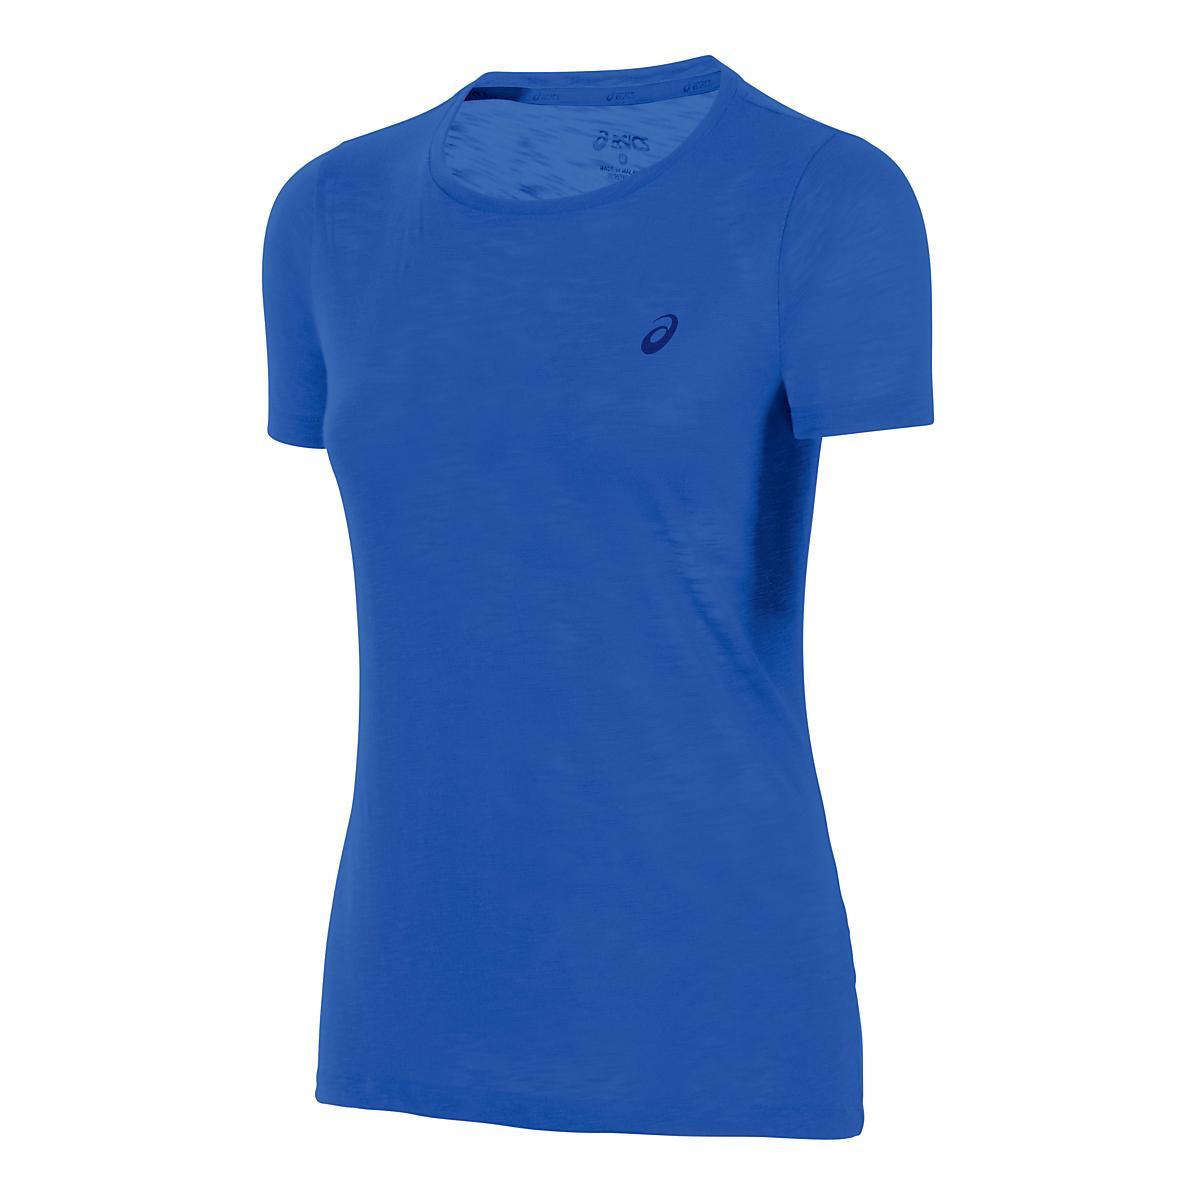 Women's ASICS�Short Sleeve Layering Top